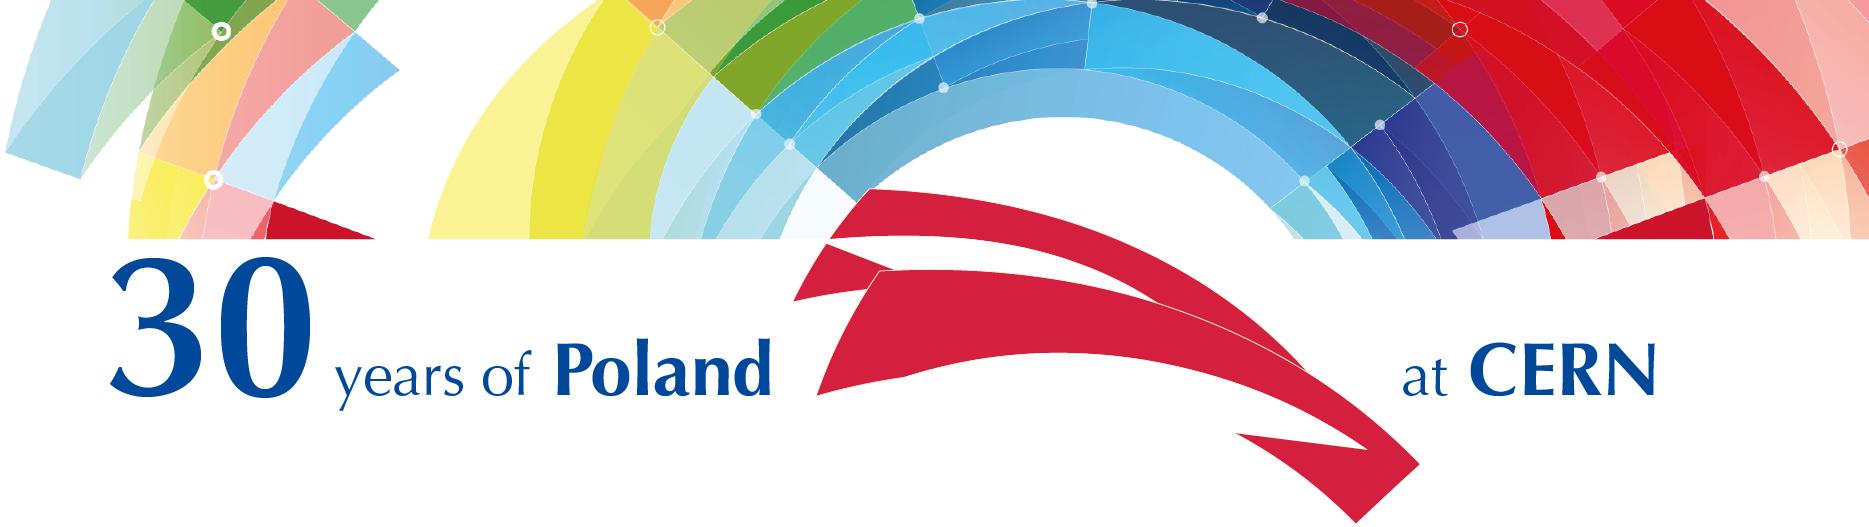 Anniversary Brandings Poland logo